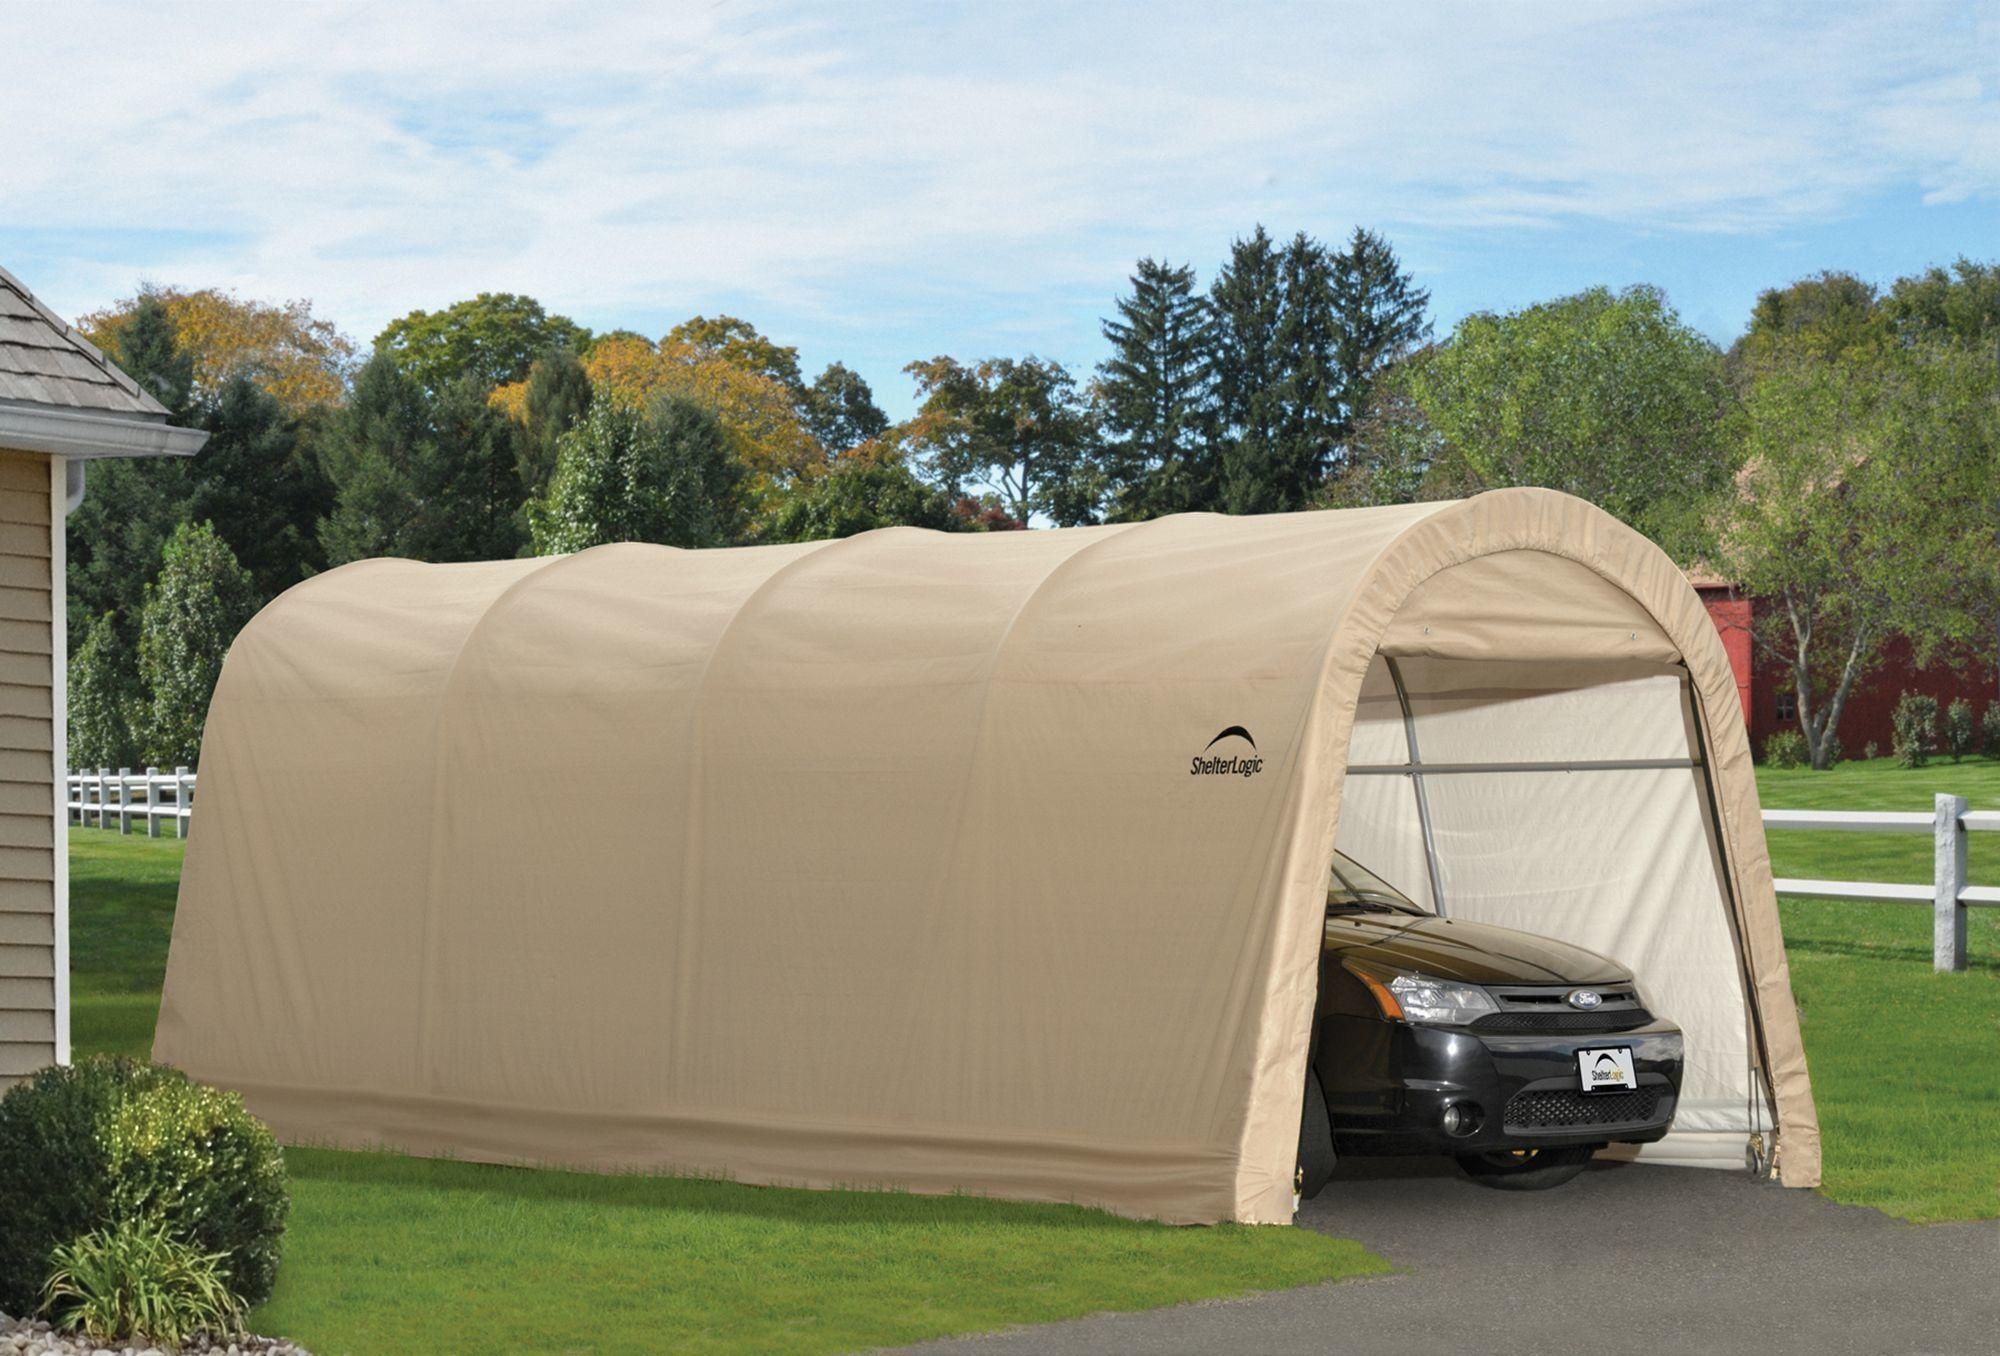 Garage Carport canopy, Instant garage, Portable carport